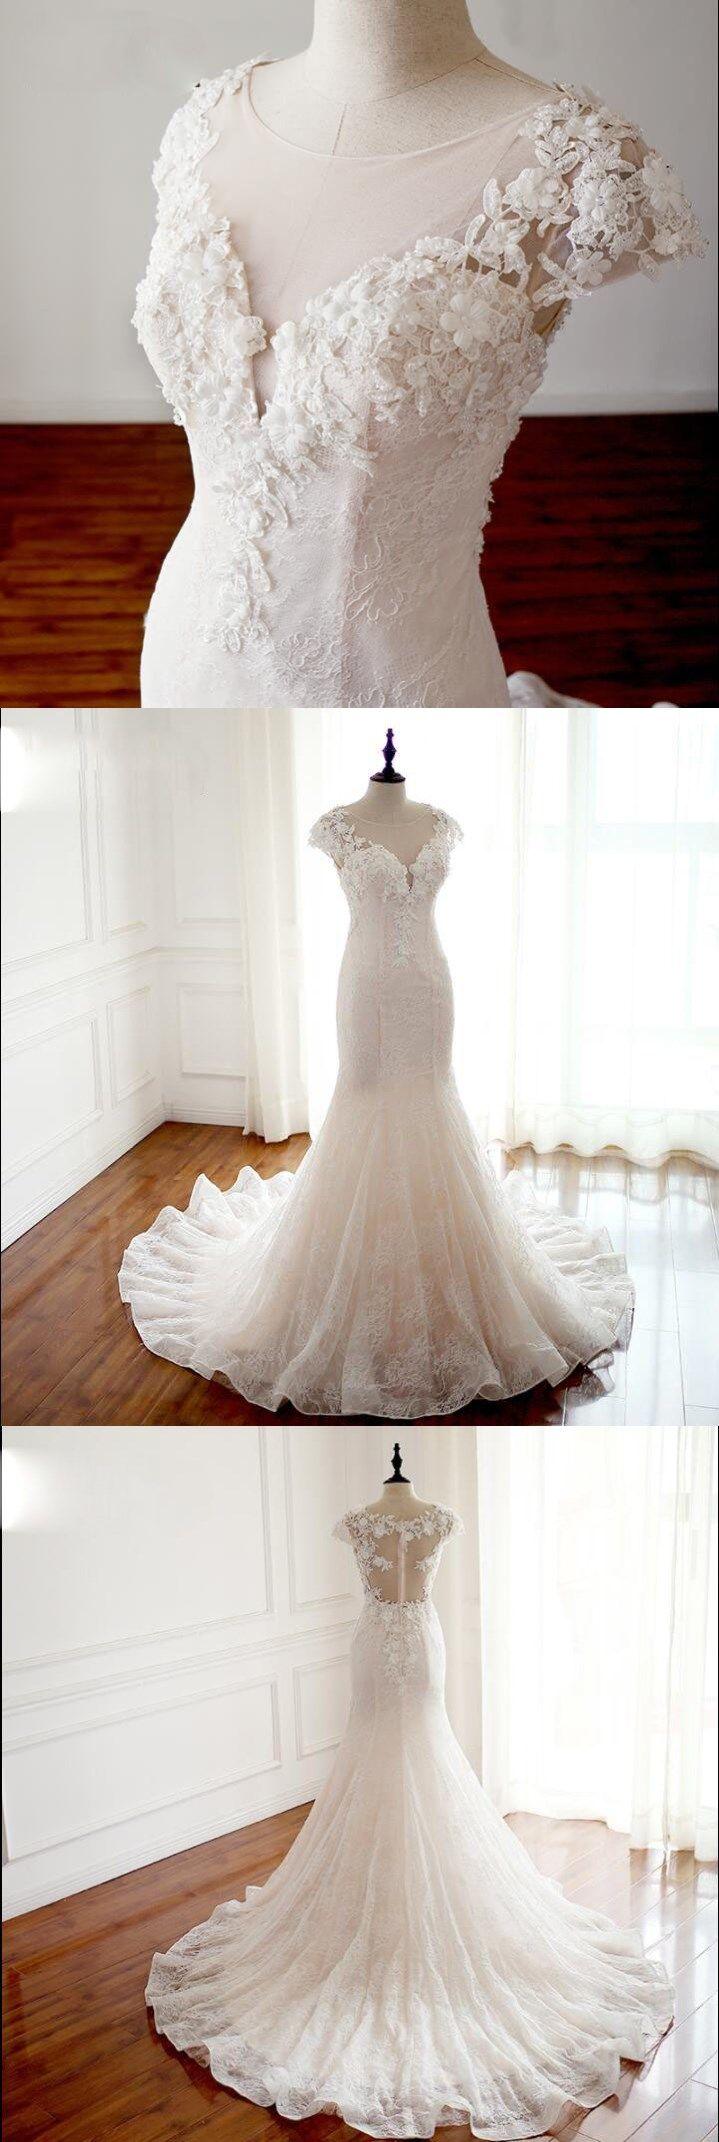 Handmade wedding dress  Cap Sleeves Trumpet Sexy Wedding Dresses High Quality Handmade